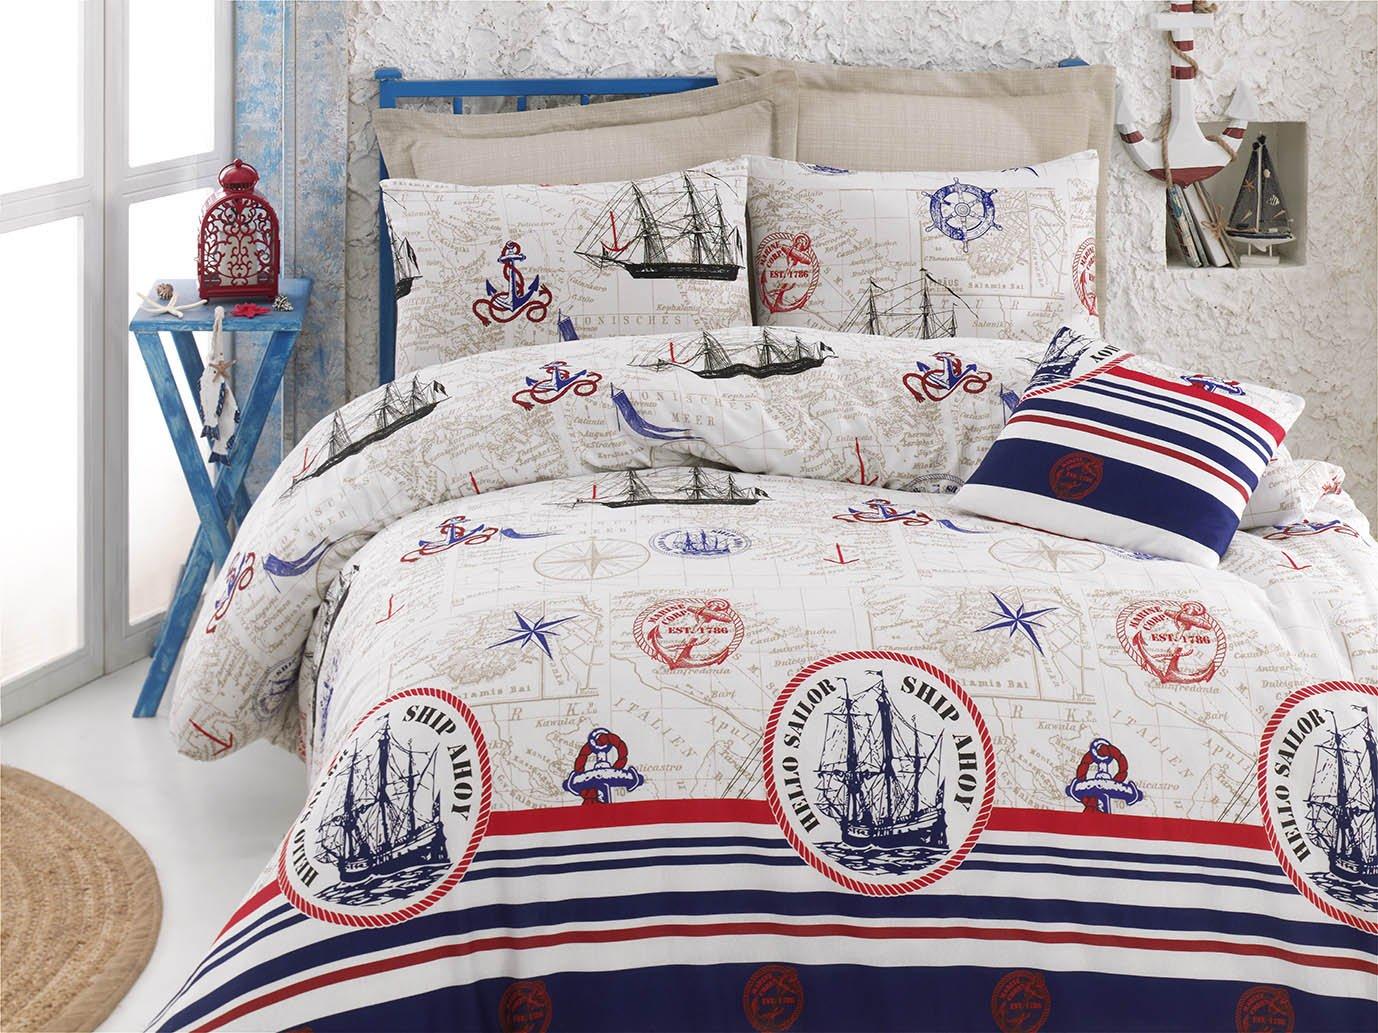 Nautical Bedding Set, Vintage Ship Themed Full/Queen Size Quilt/Duvet Cover Set, COMFORTER INCLUDED (5 Pcs) DecoMood